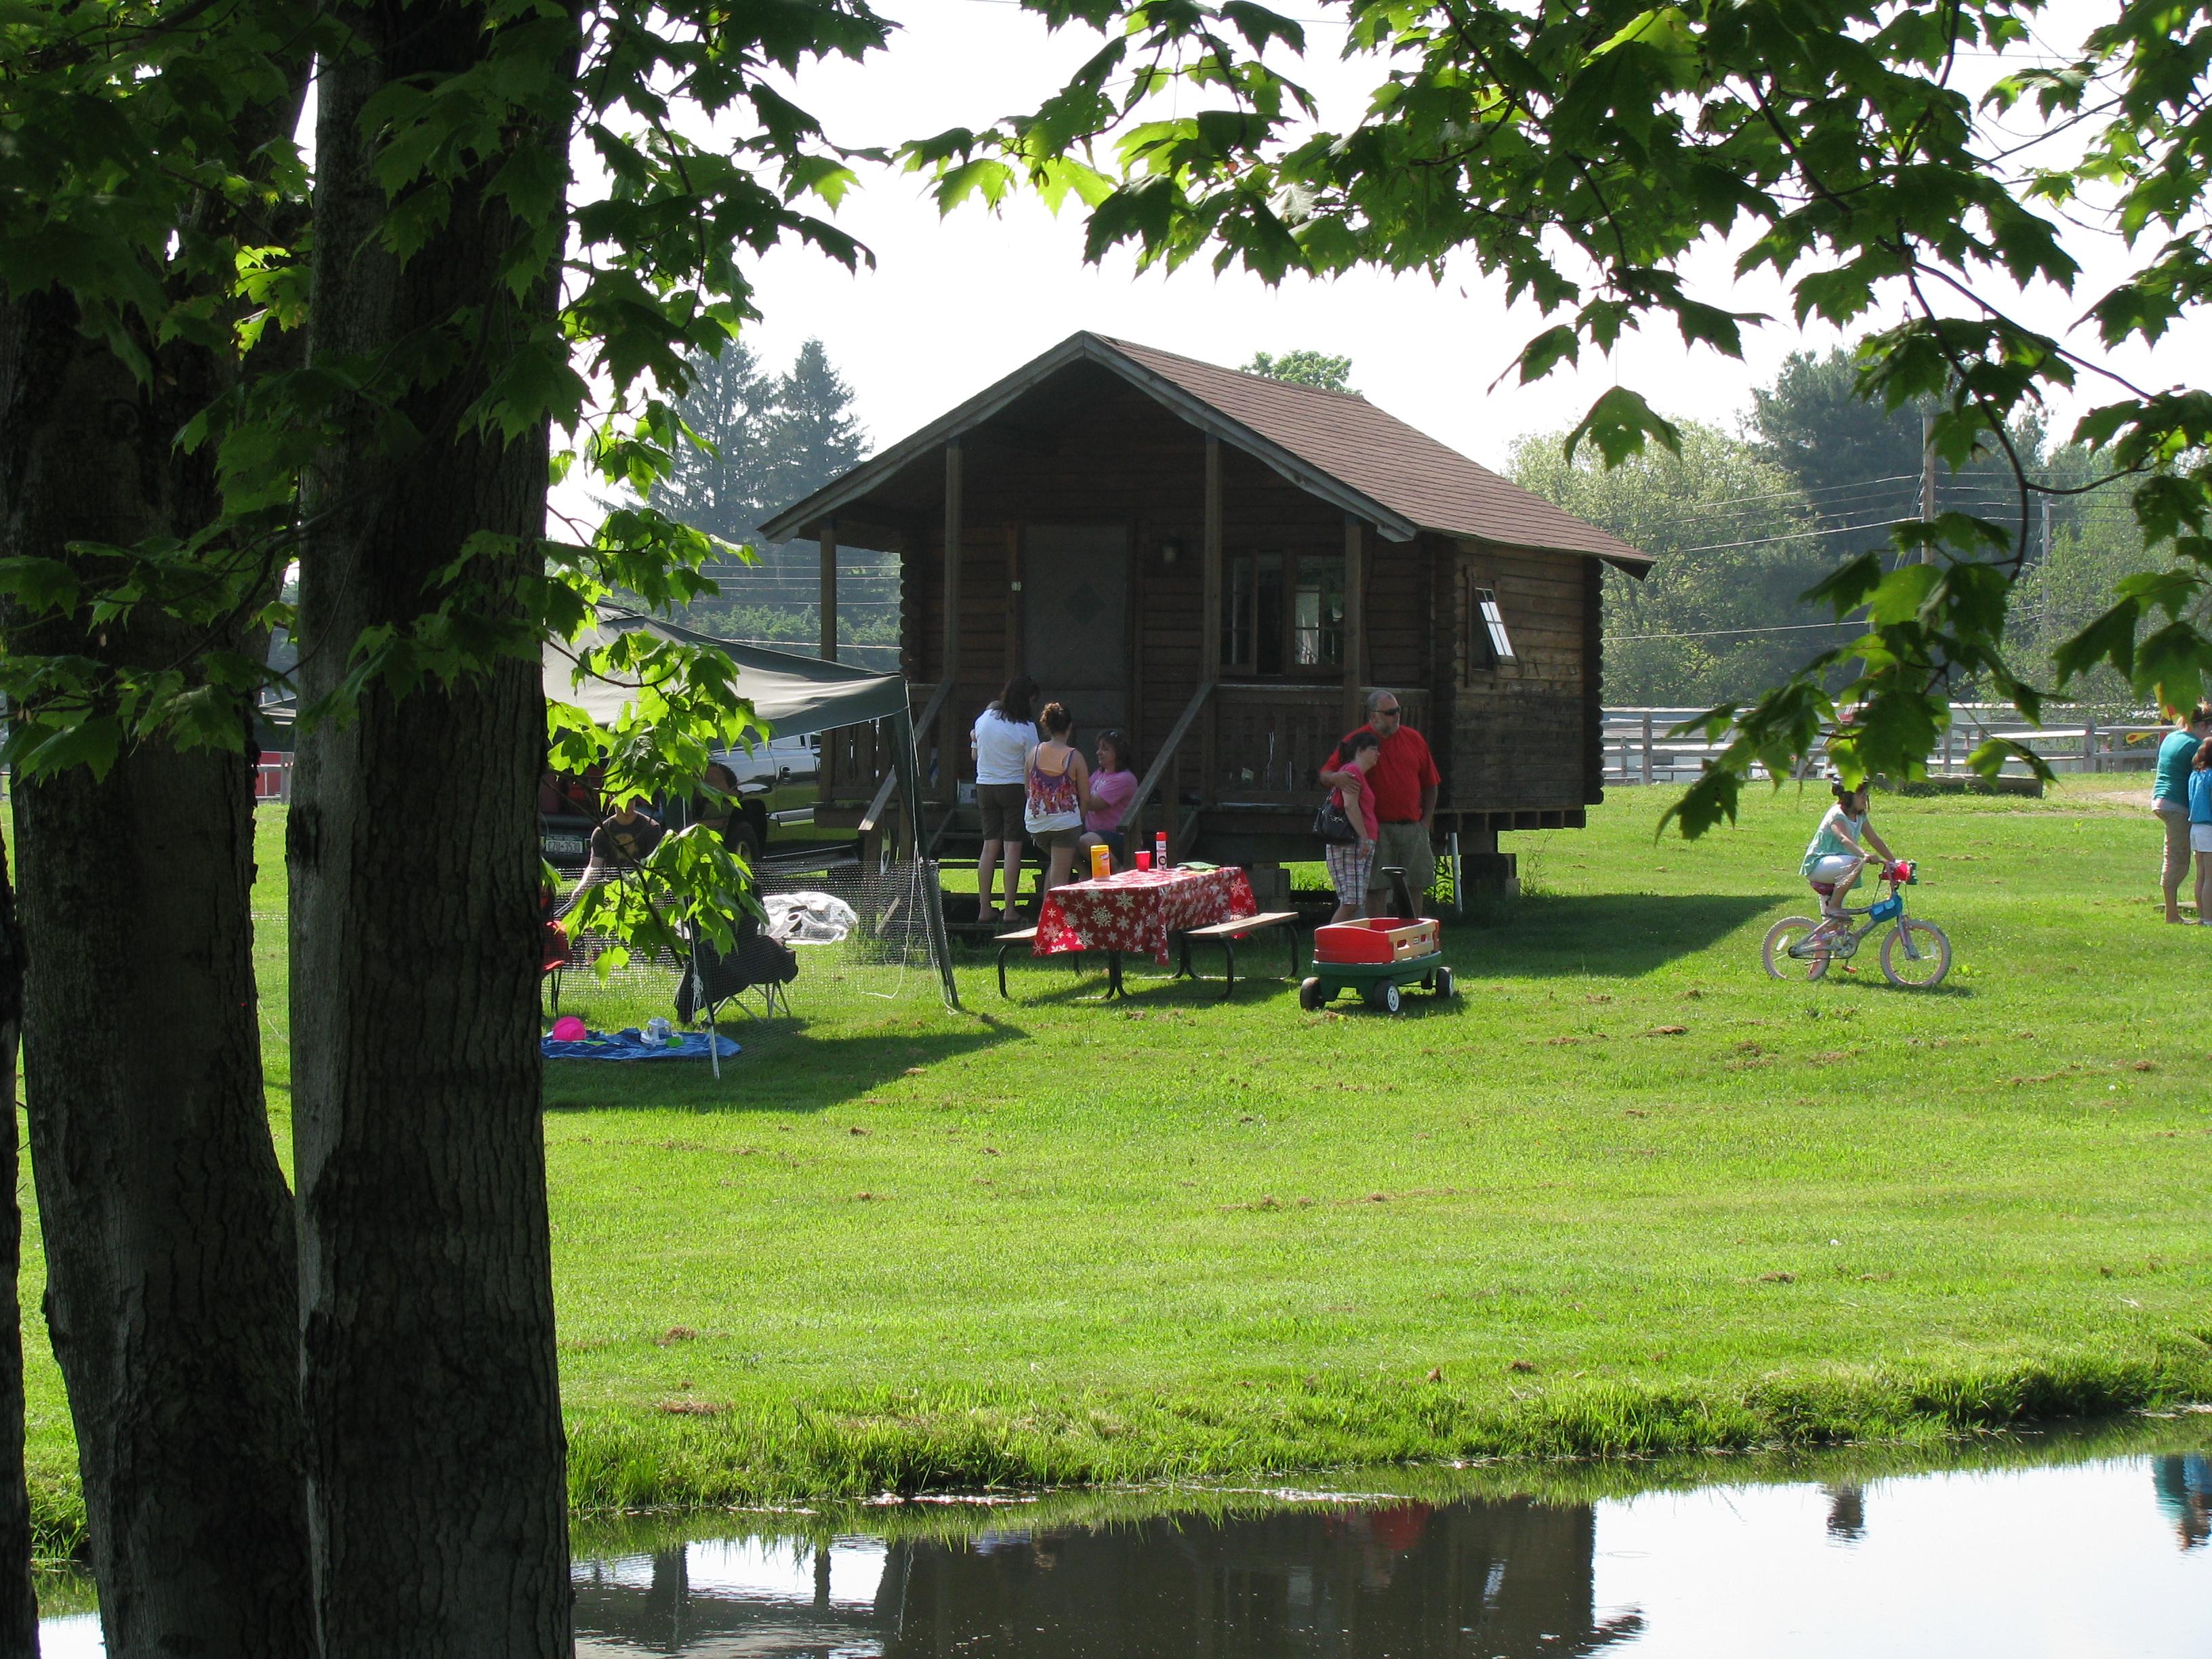 Meadville KOA image 4